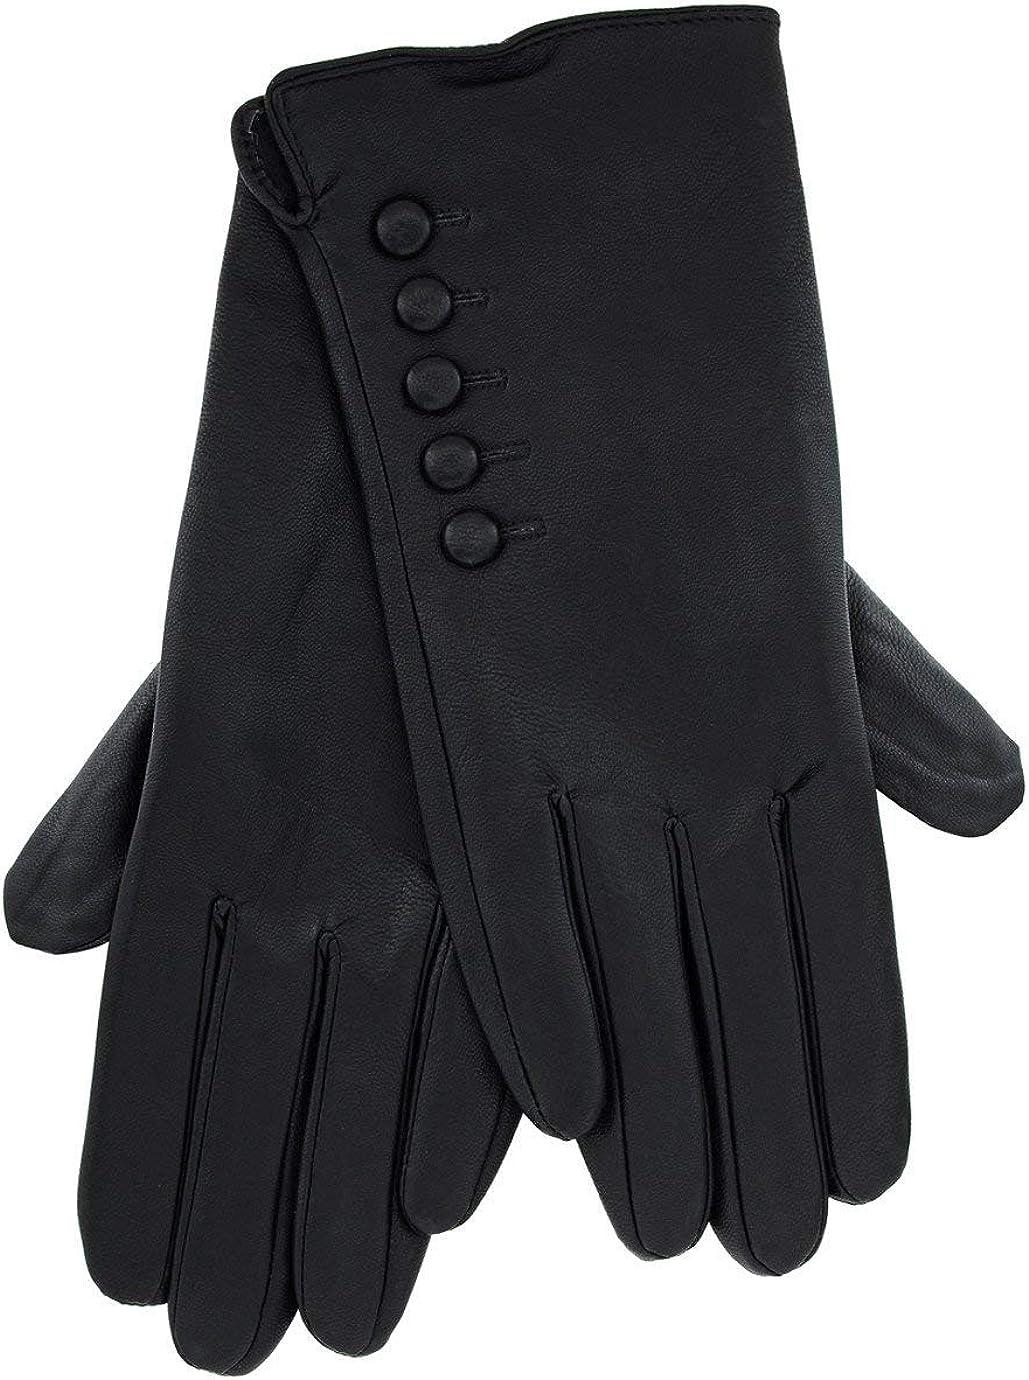 DOLORES Black Eco-Leather...